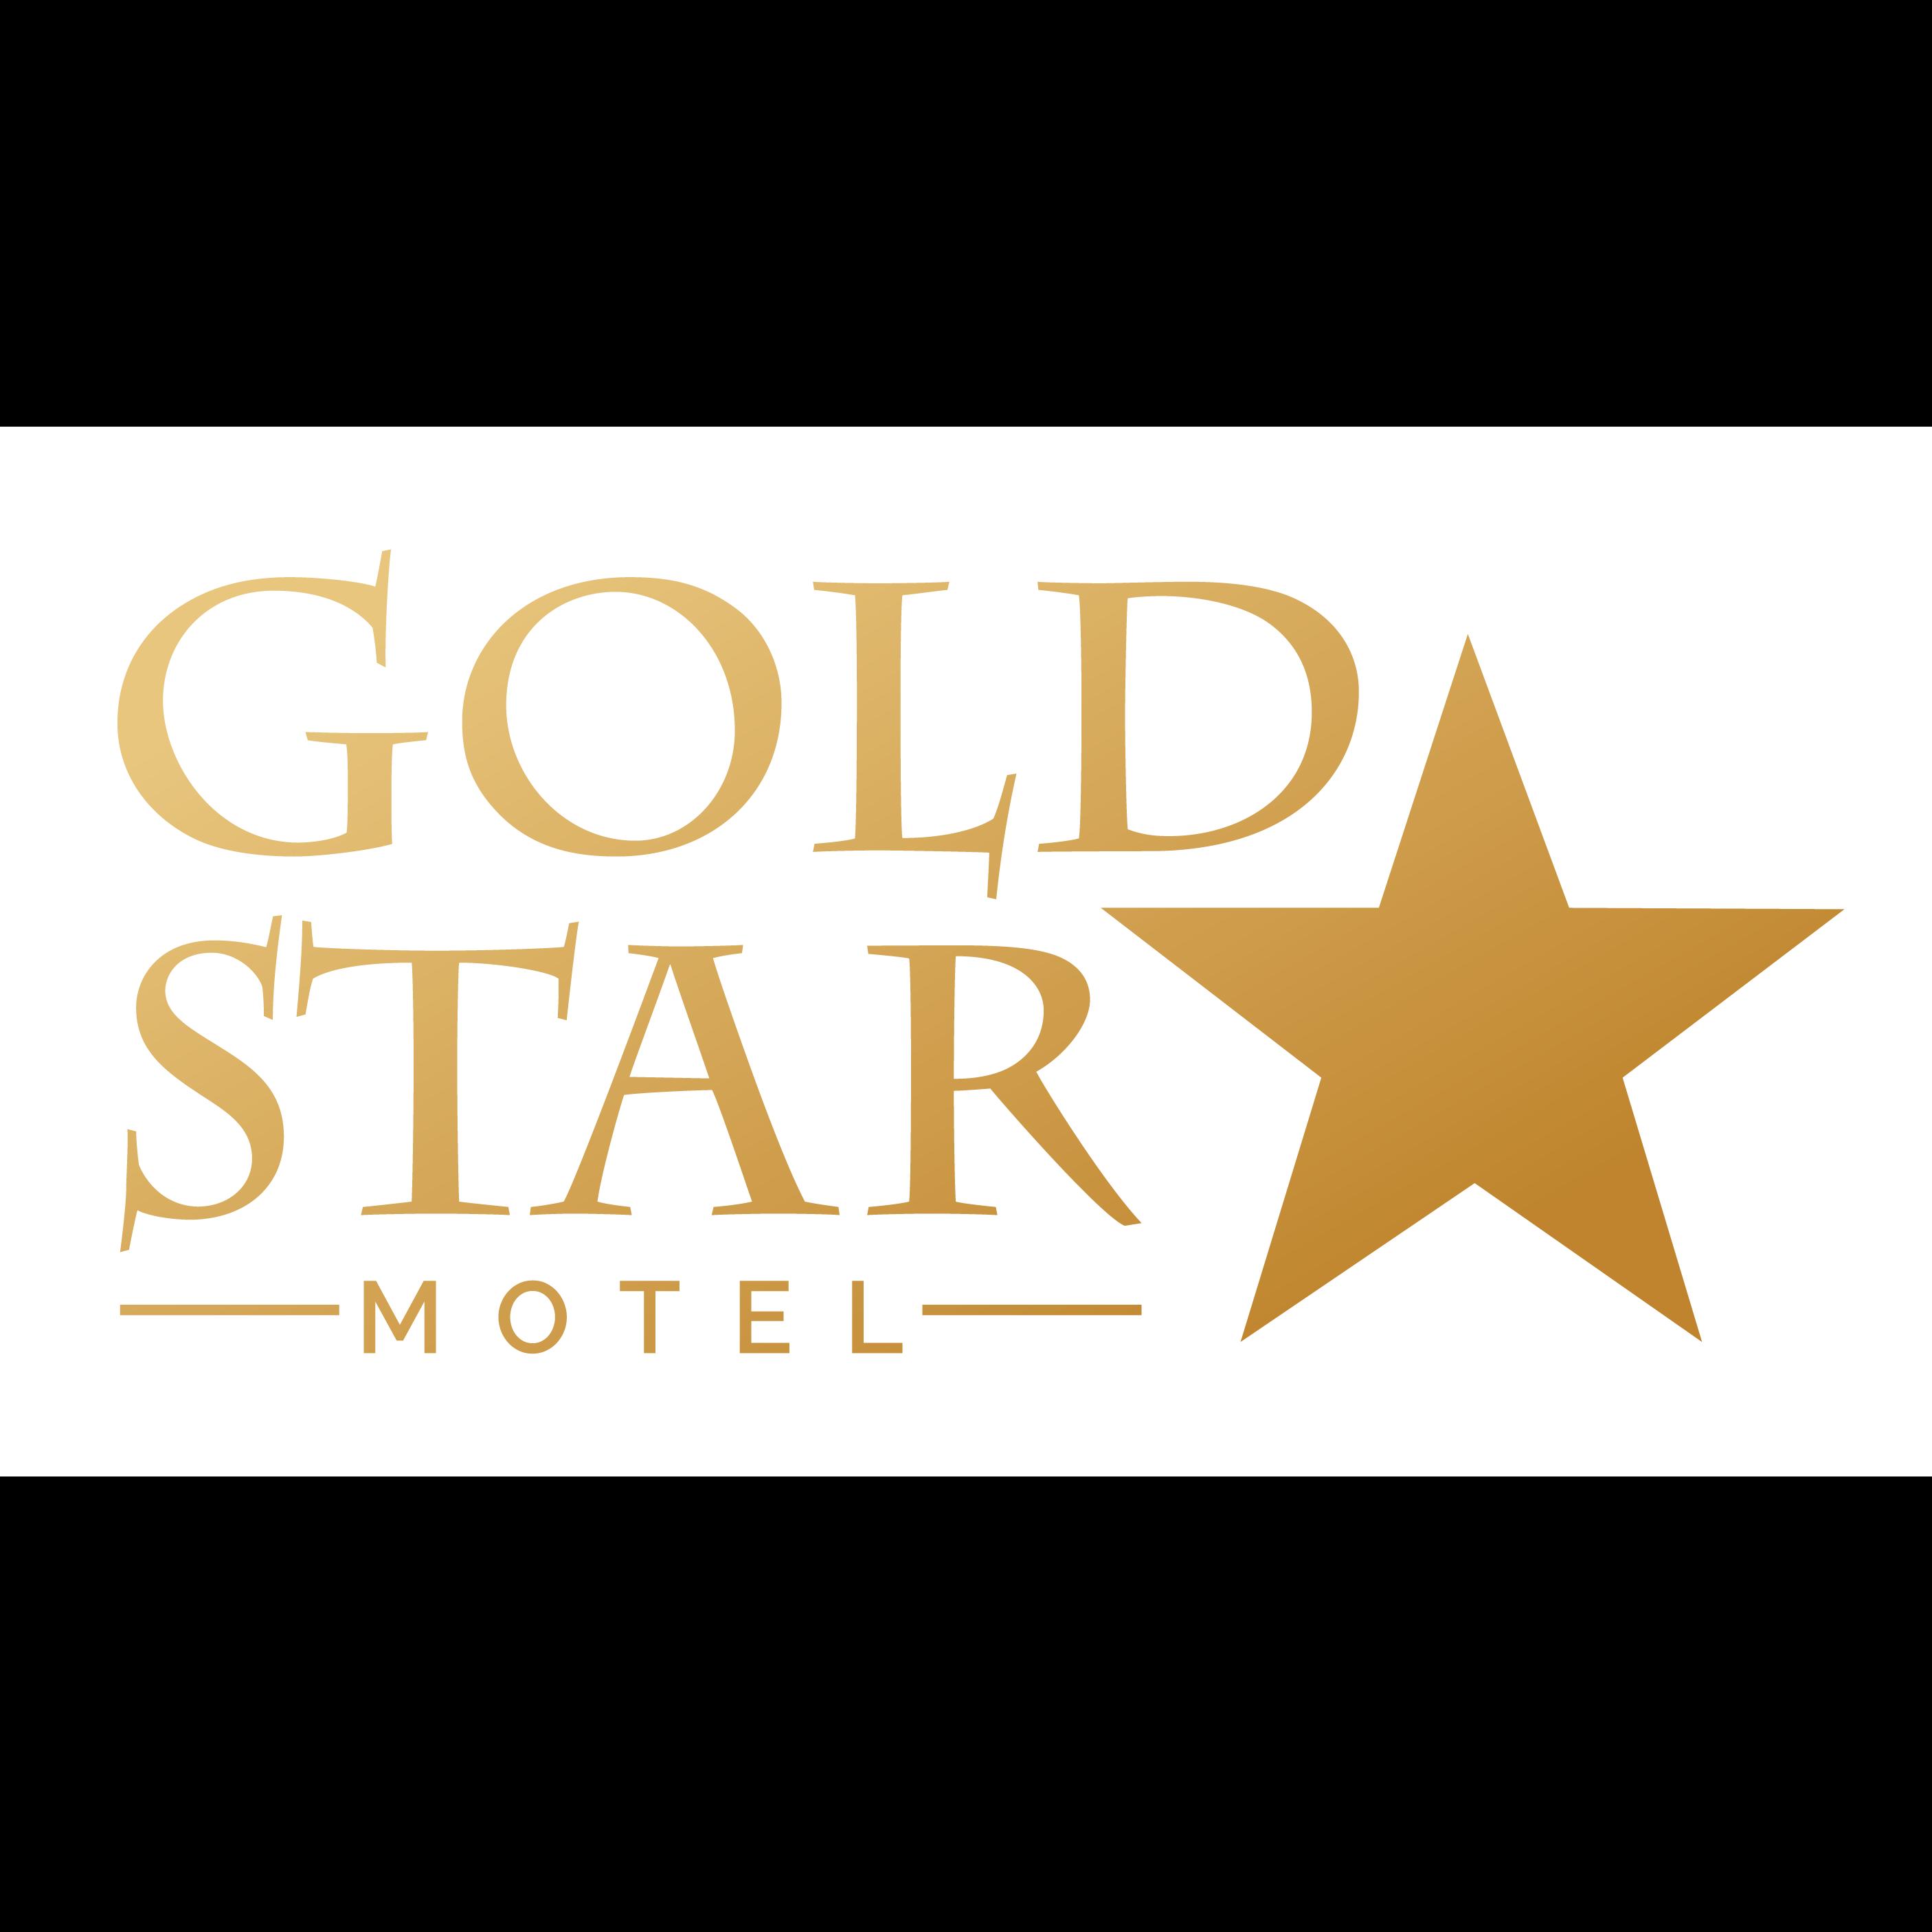 Gold Star Motel image 1